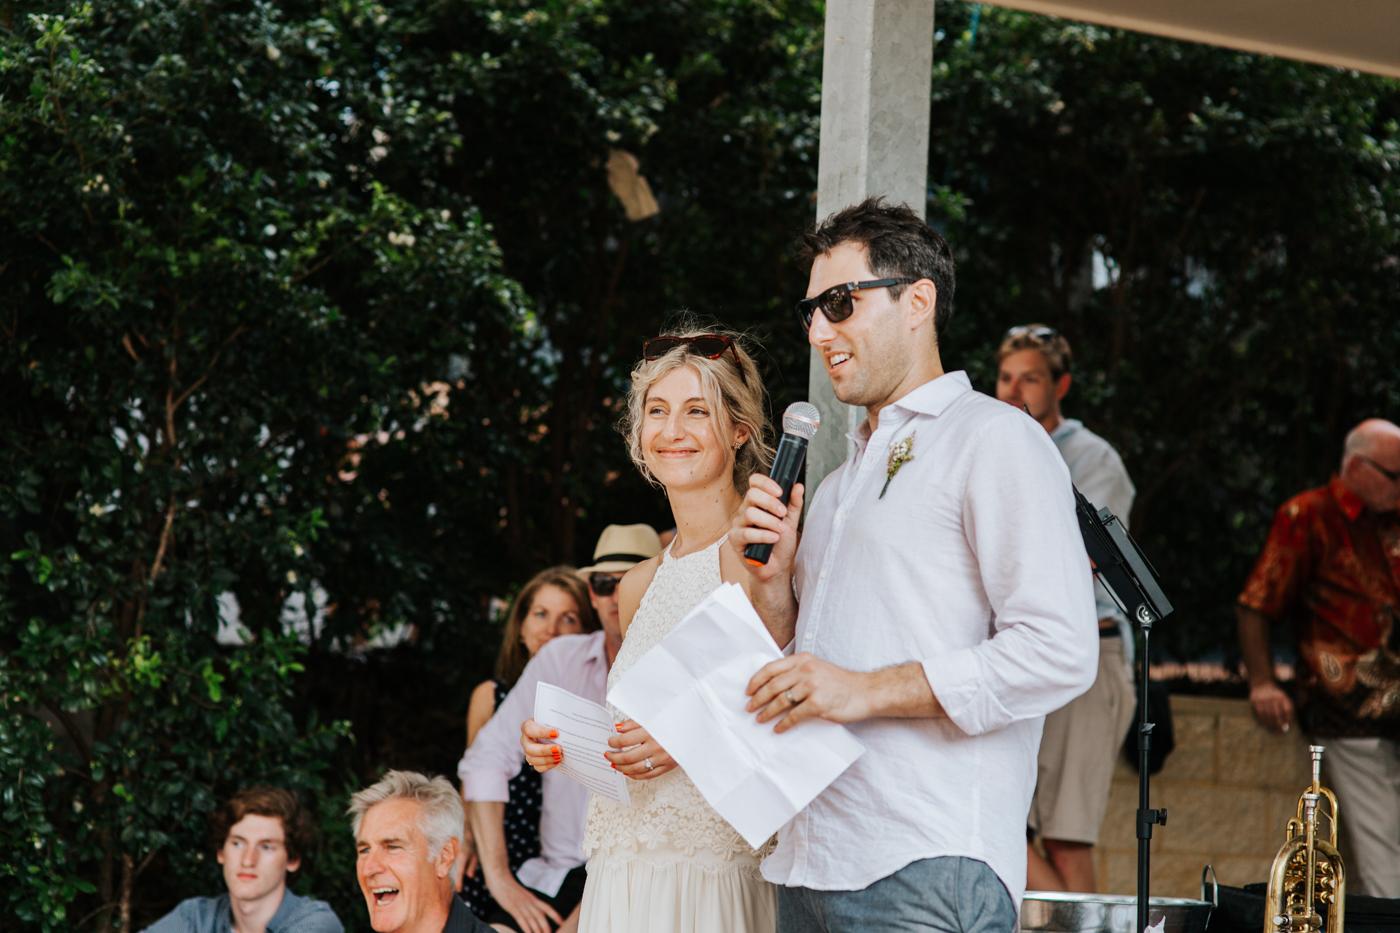 Emma & Ben - Lake Macquarie - Hunter Valley Wedding - Samantha Heather Photography-164.jpg